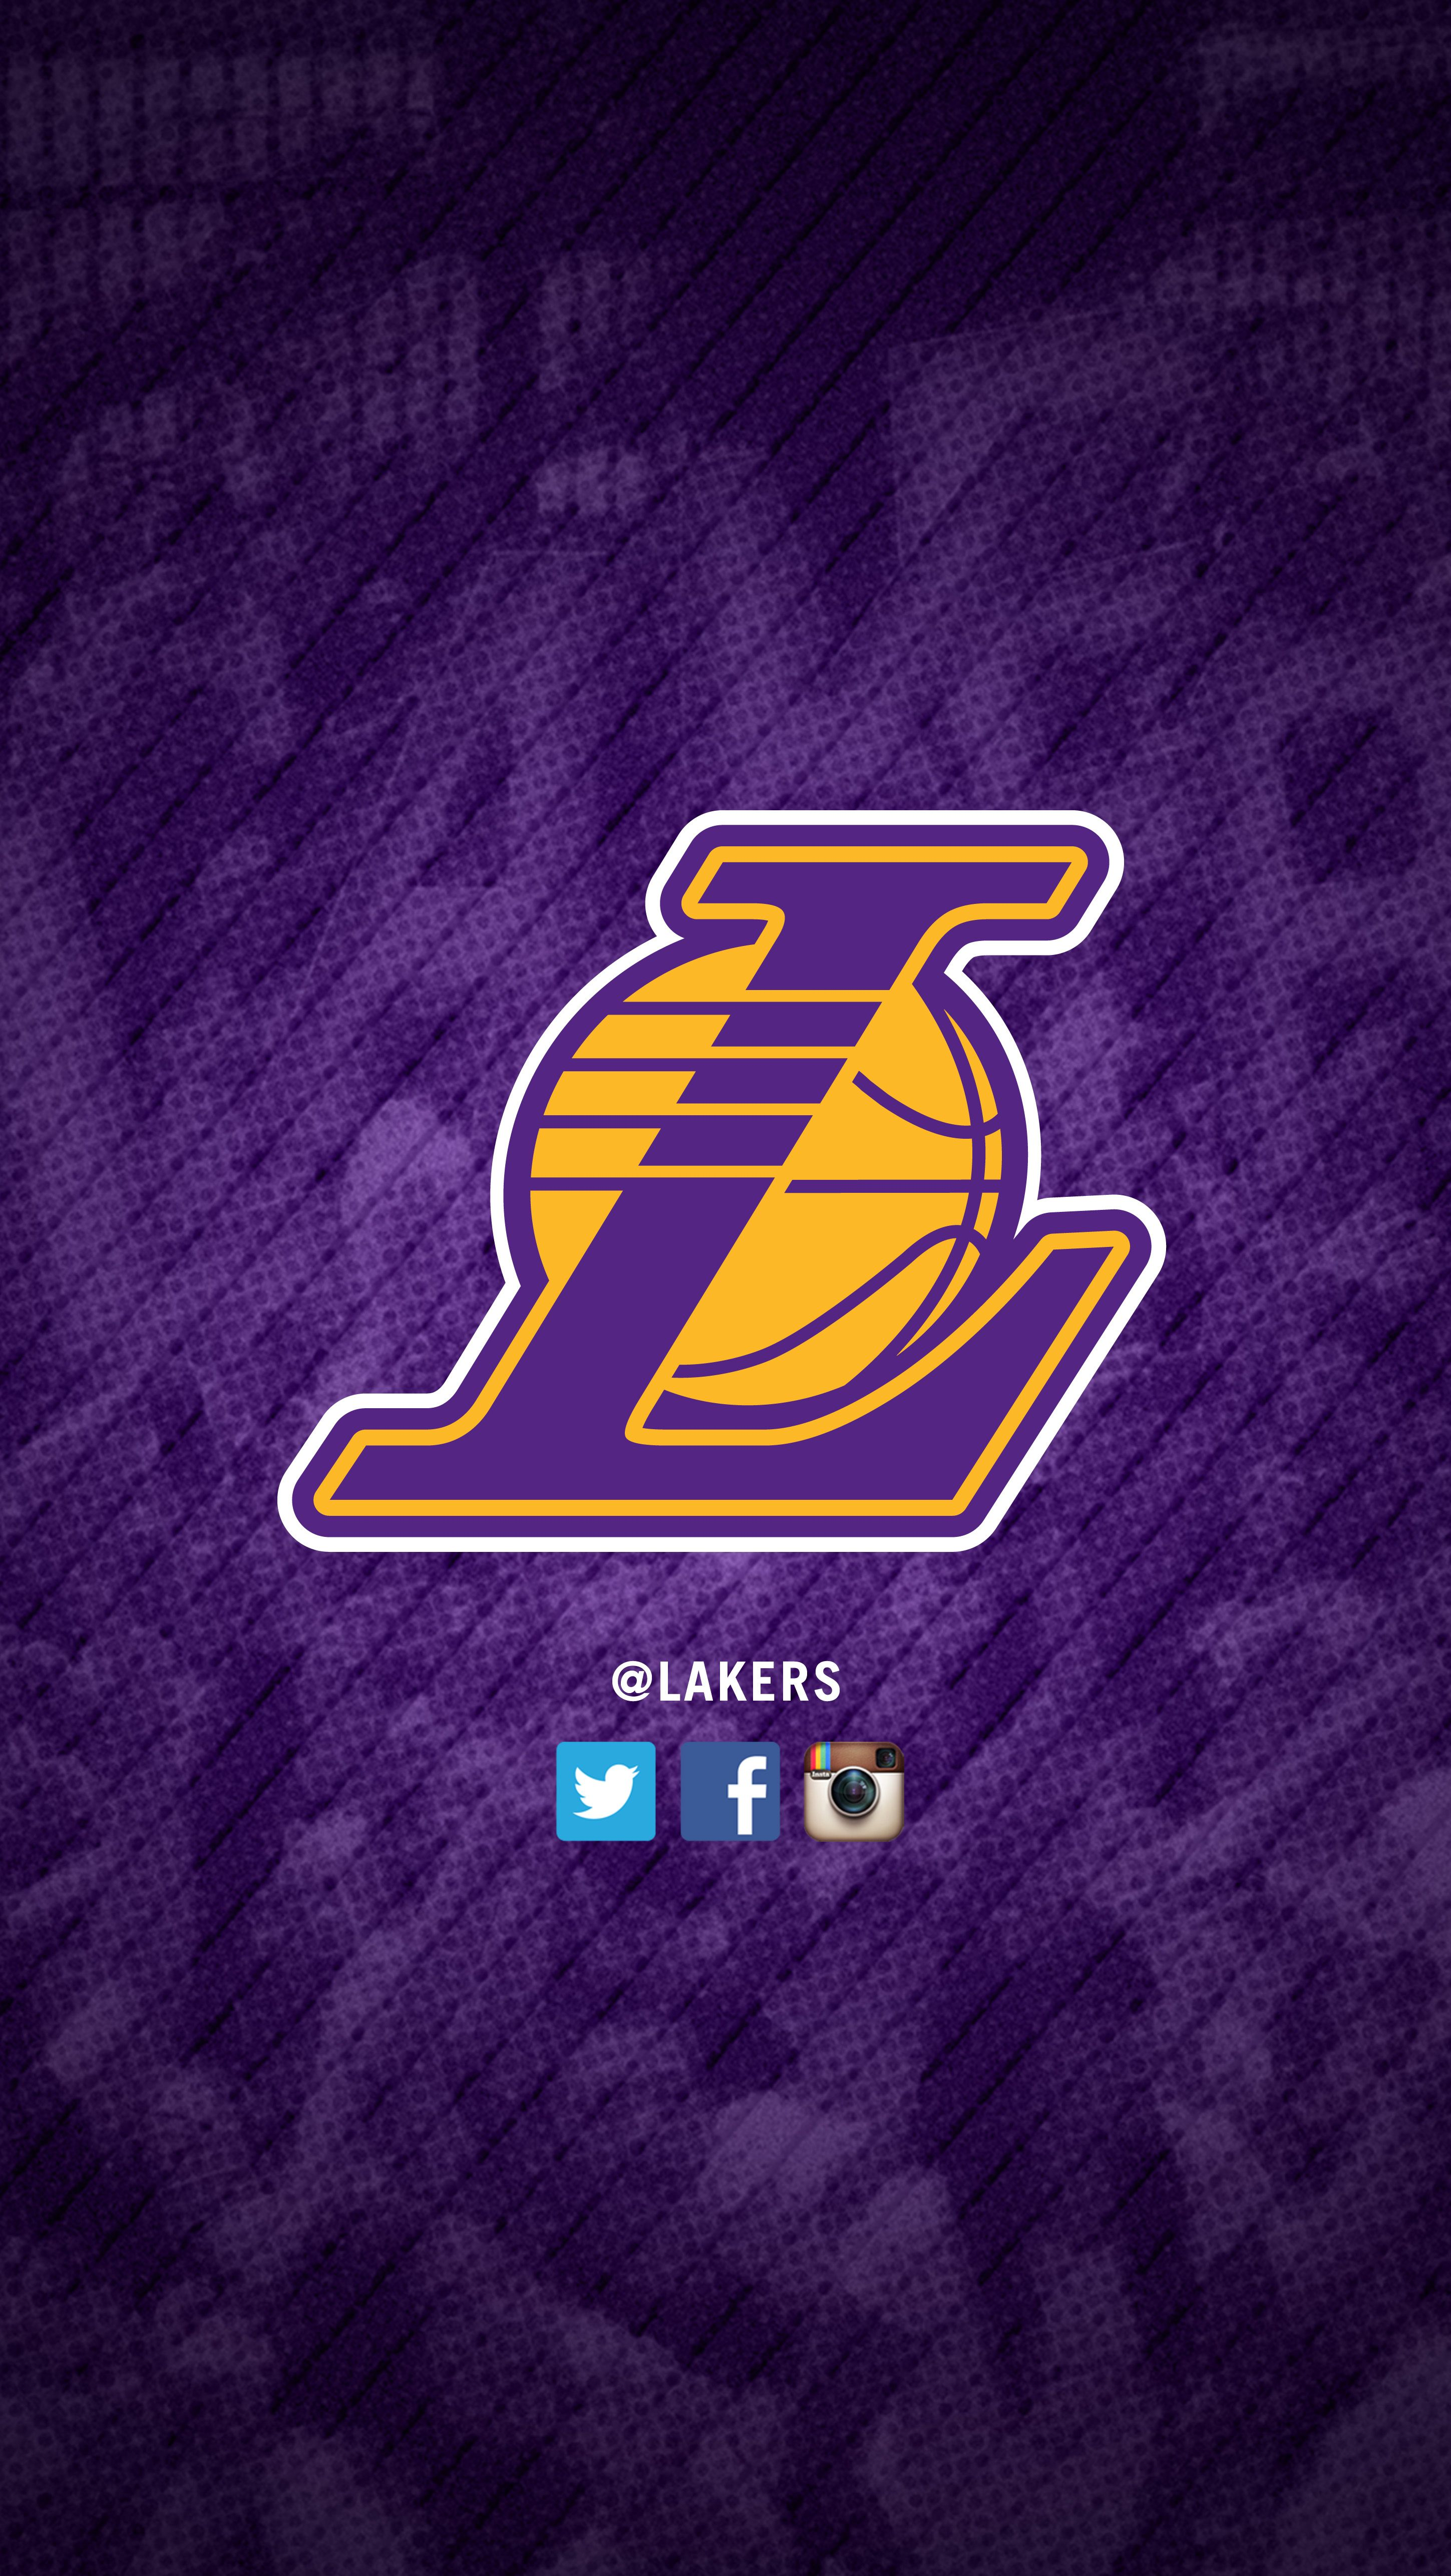 K Ultra Hd Los Angeles Lakers Wallpapers Hd Desktop Backgrounds